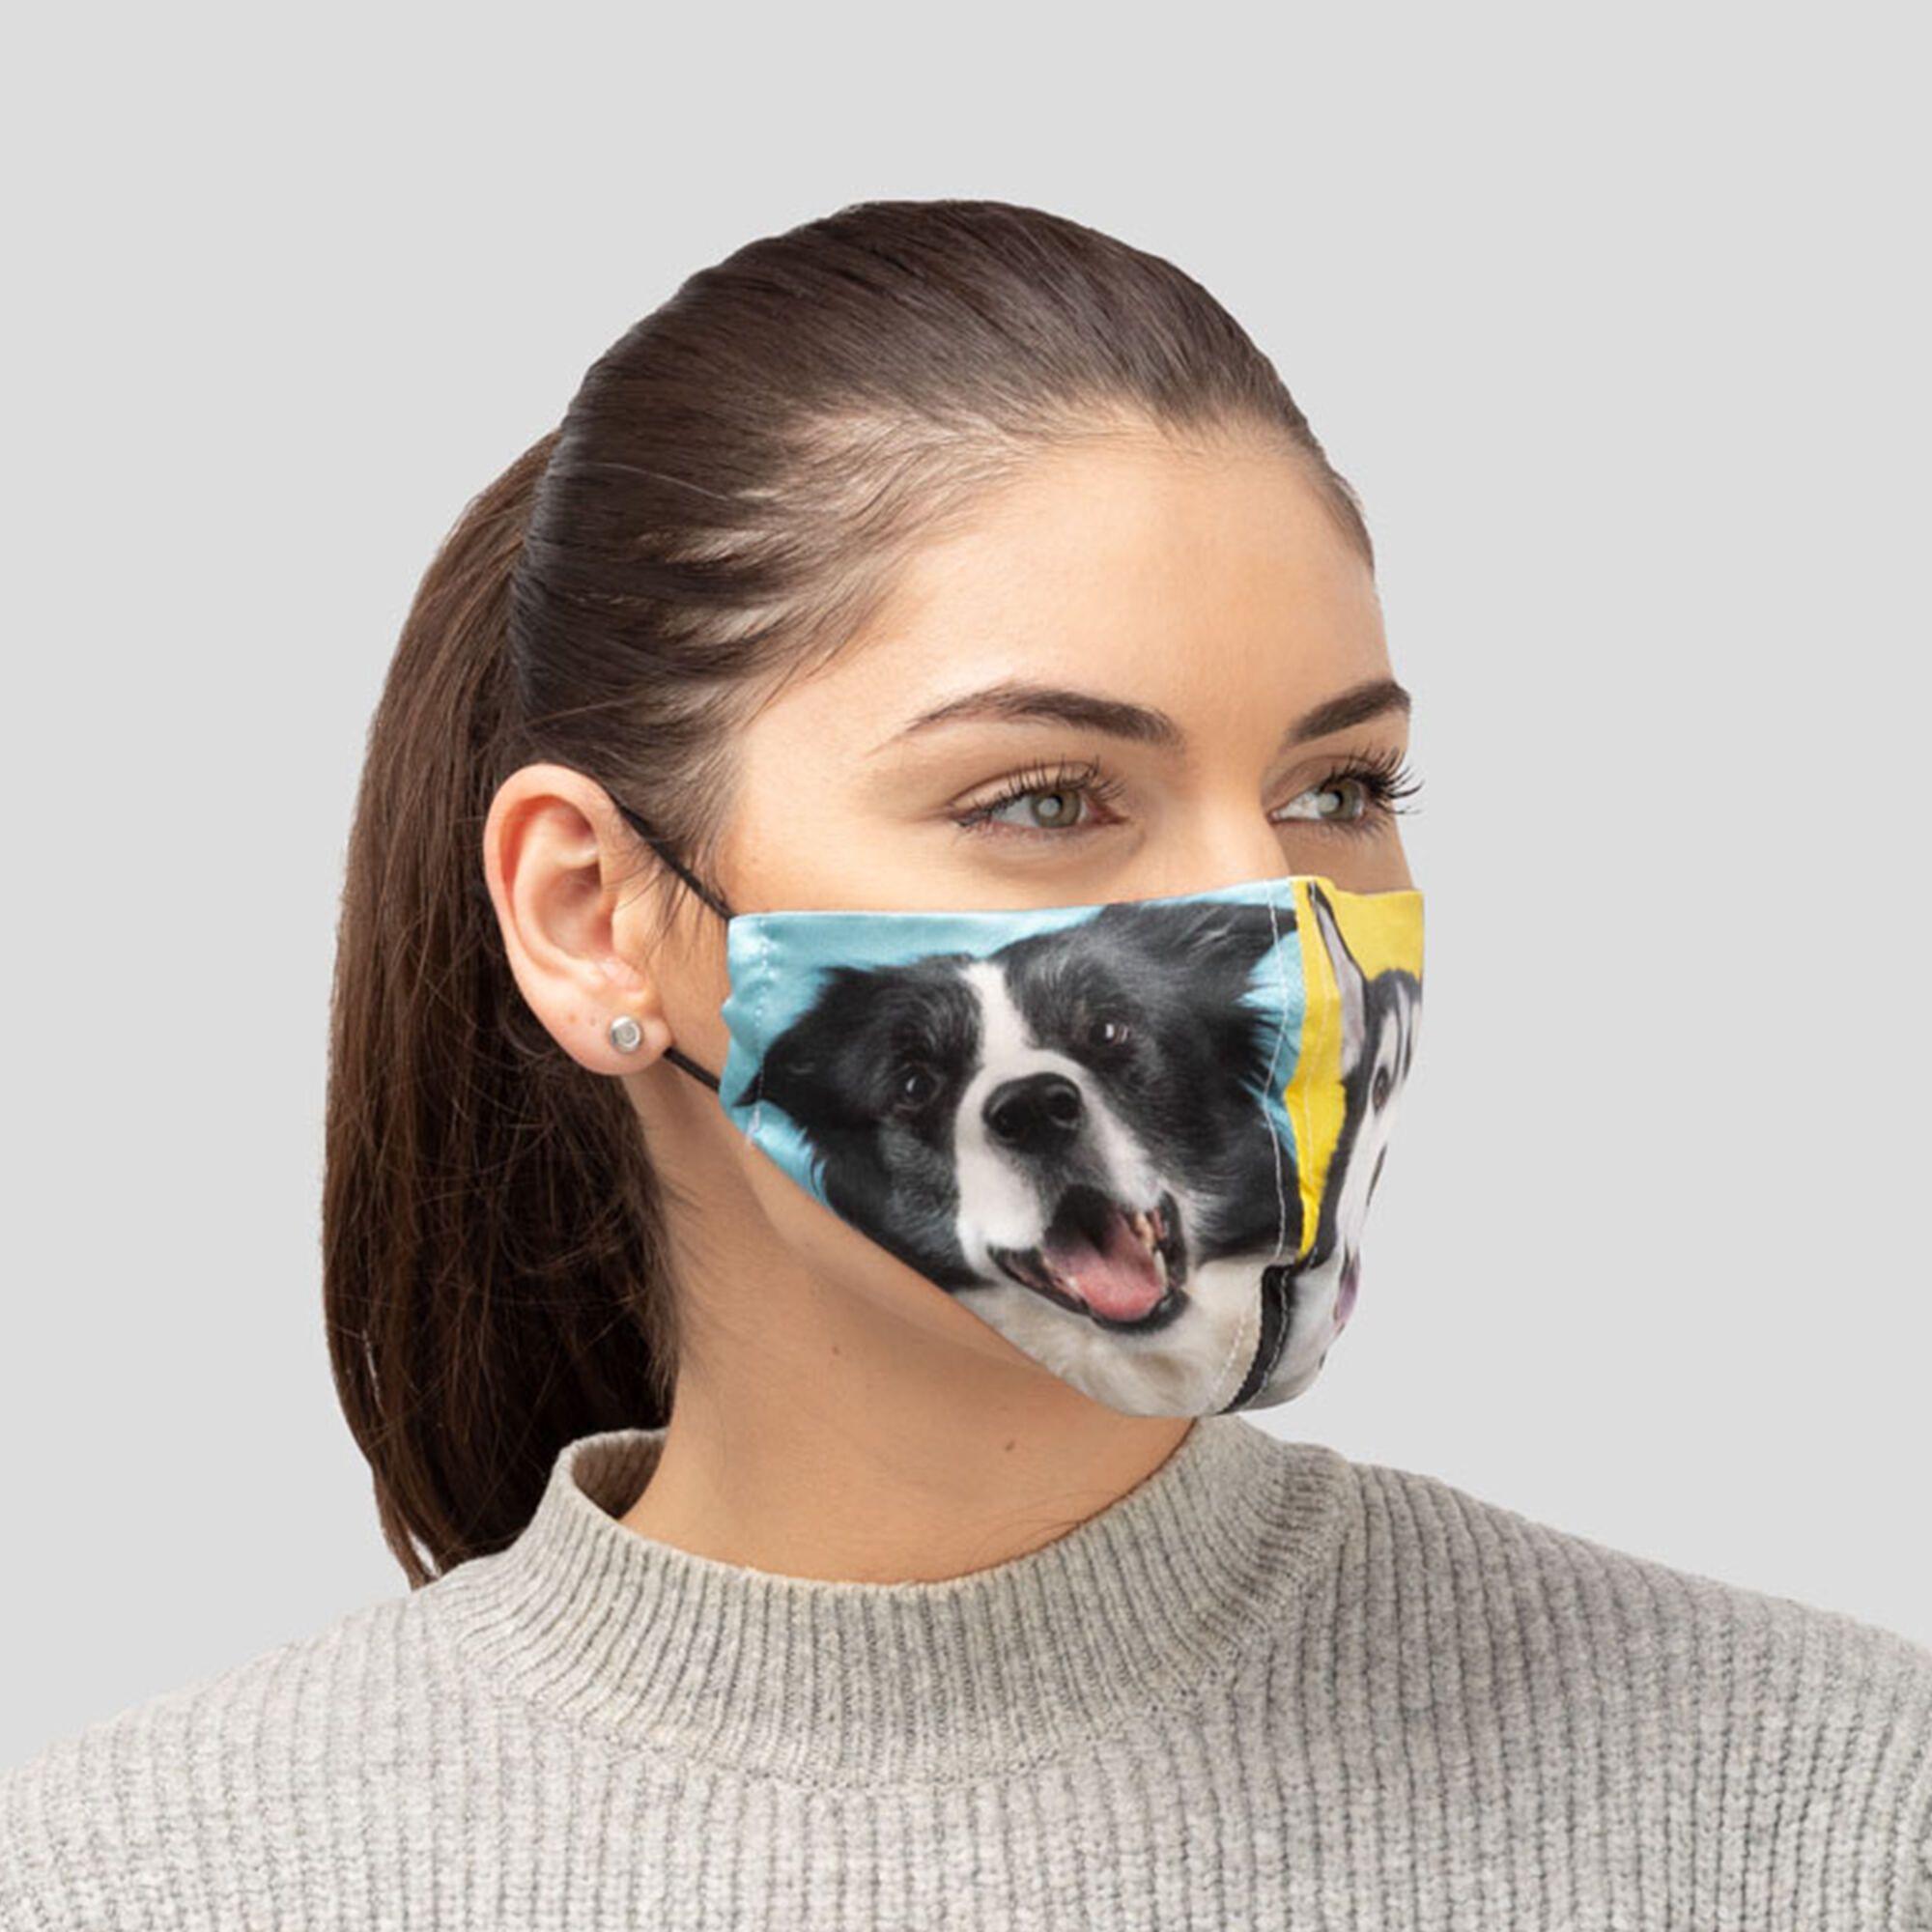 Bespoke face mask Fashionable And Practical